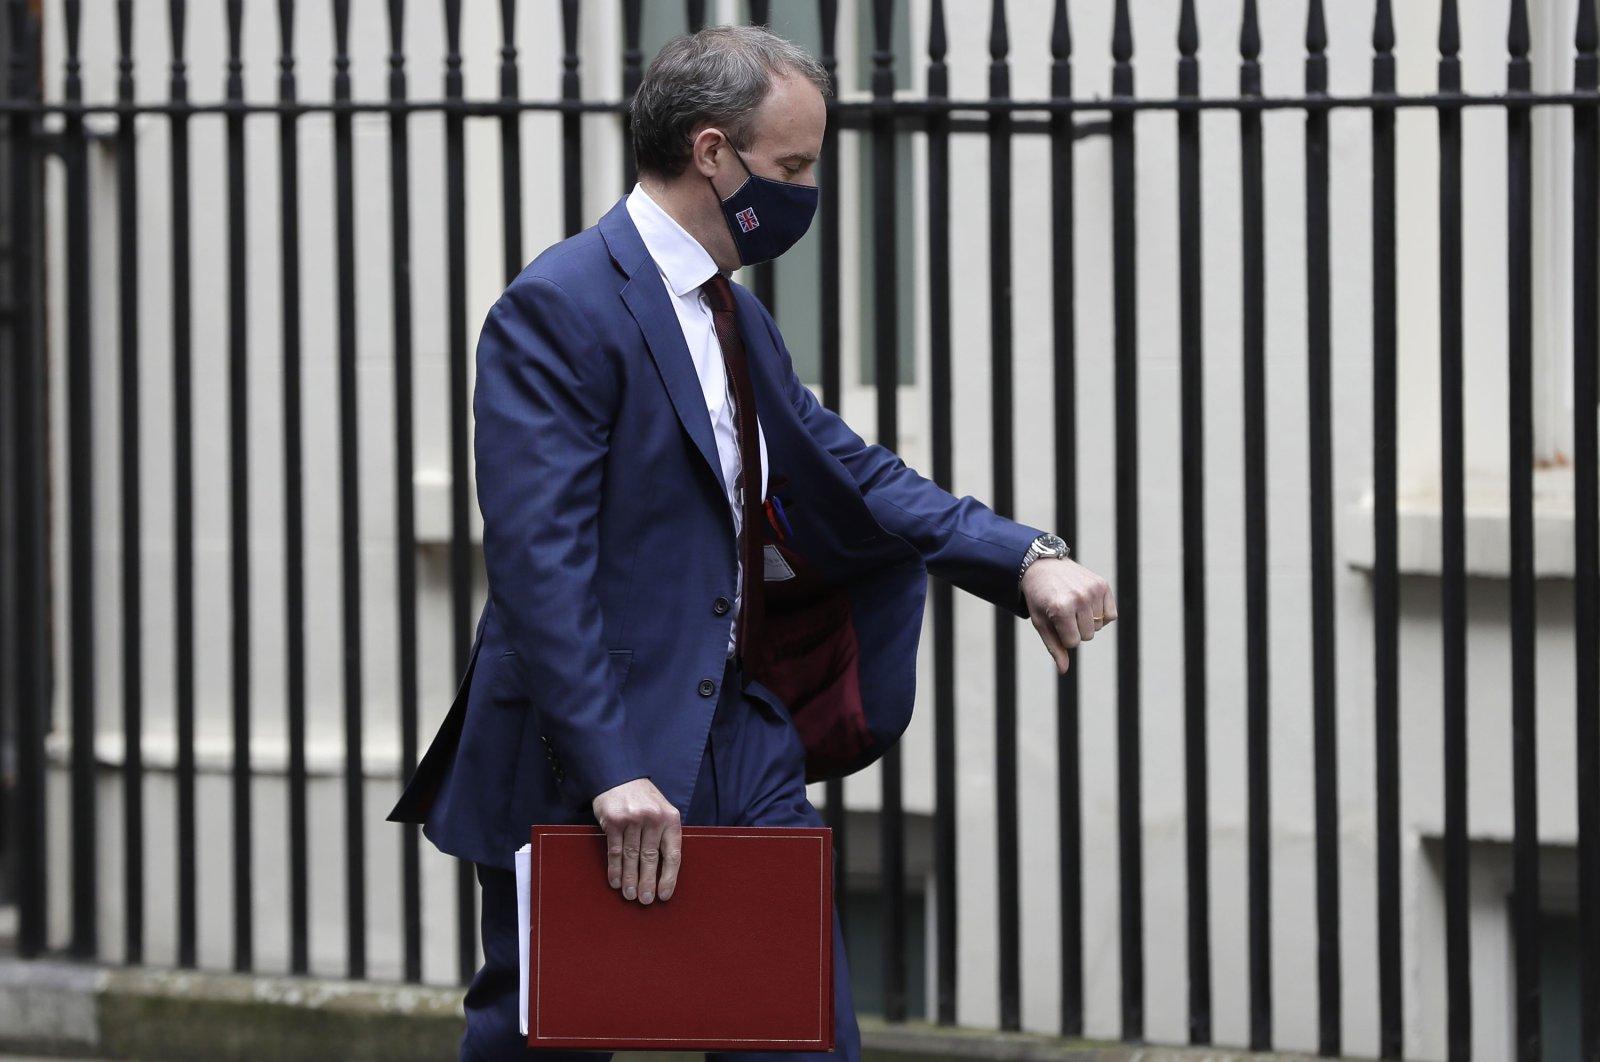 Britain's Foreign Secretary Dominic Raab checks his watch as he walks across Downing Street in London, Wednesday, Feb. 24, 2021. (AP Photo)